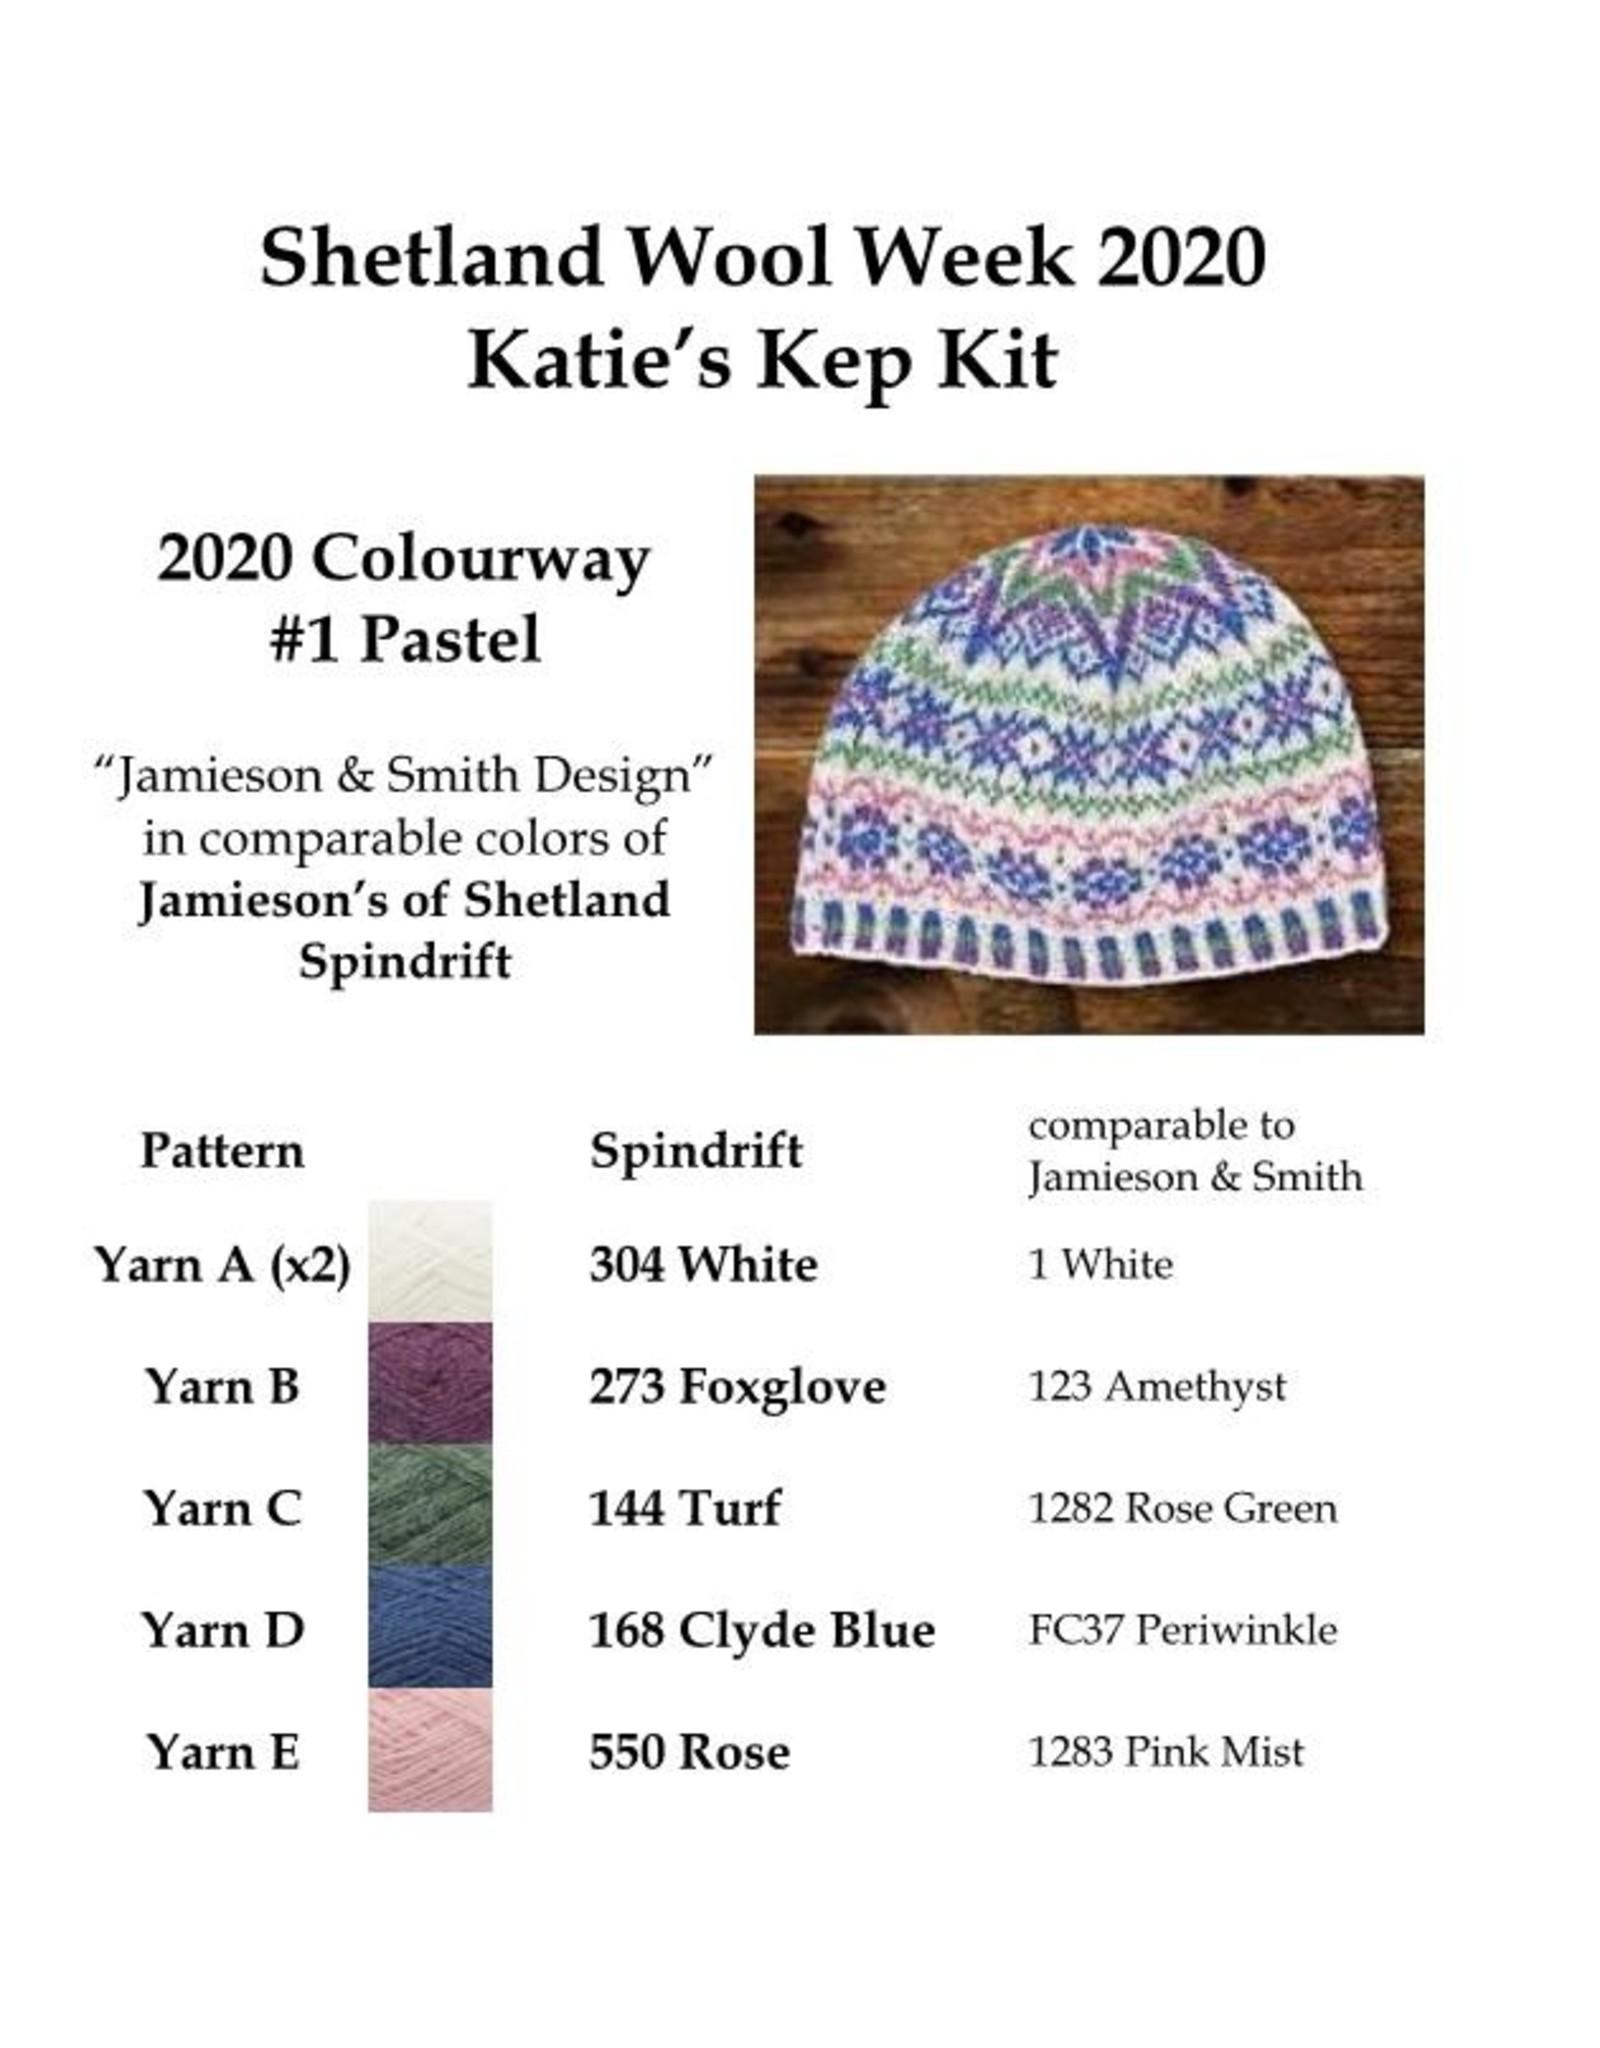 Jamieson's of Shetland Shetland Wool Week Kit